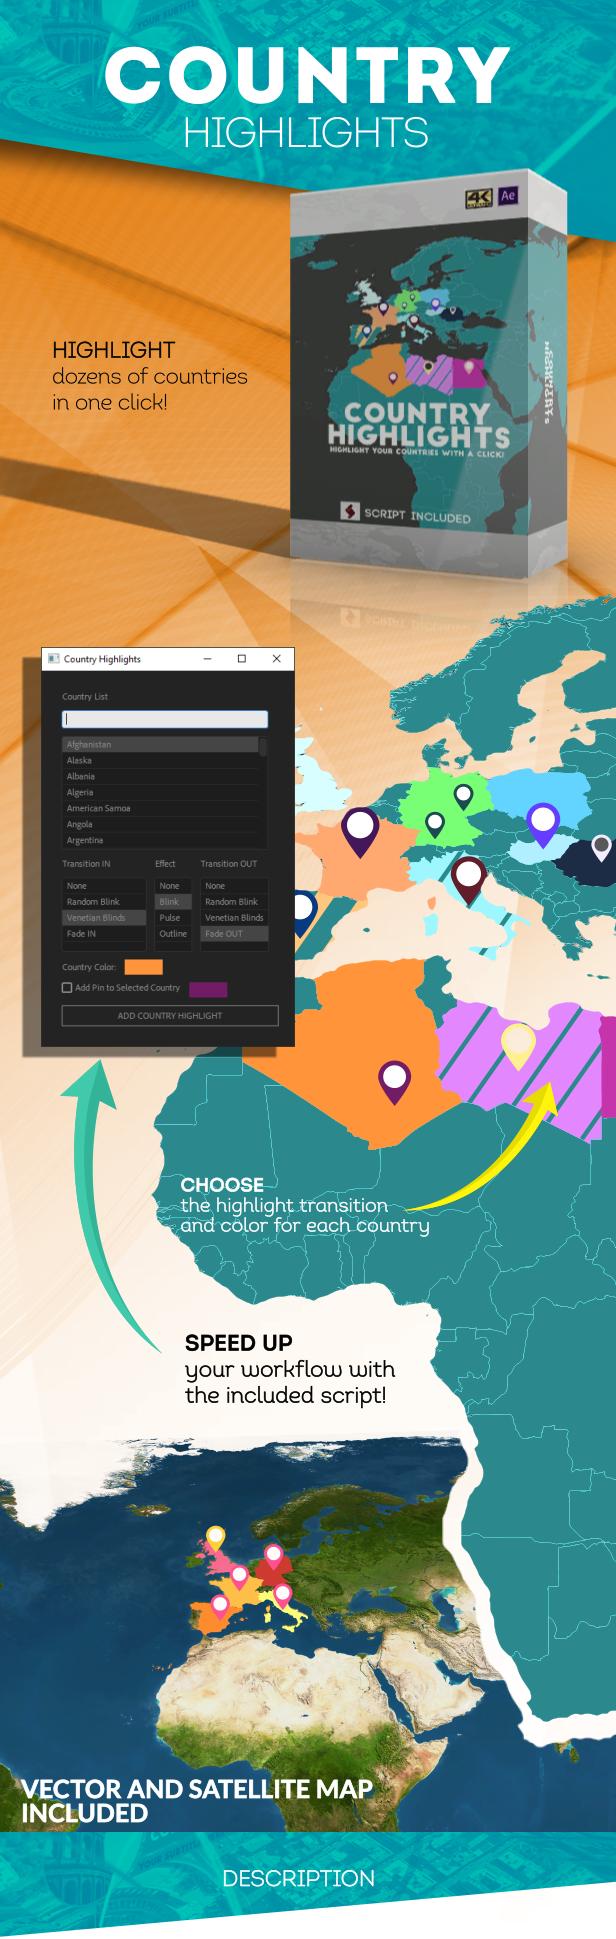 创意地球冲击地图连线路径地点方位标注动画AE模板素材 Videohive – Animated Map Toolkit插图5